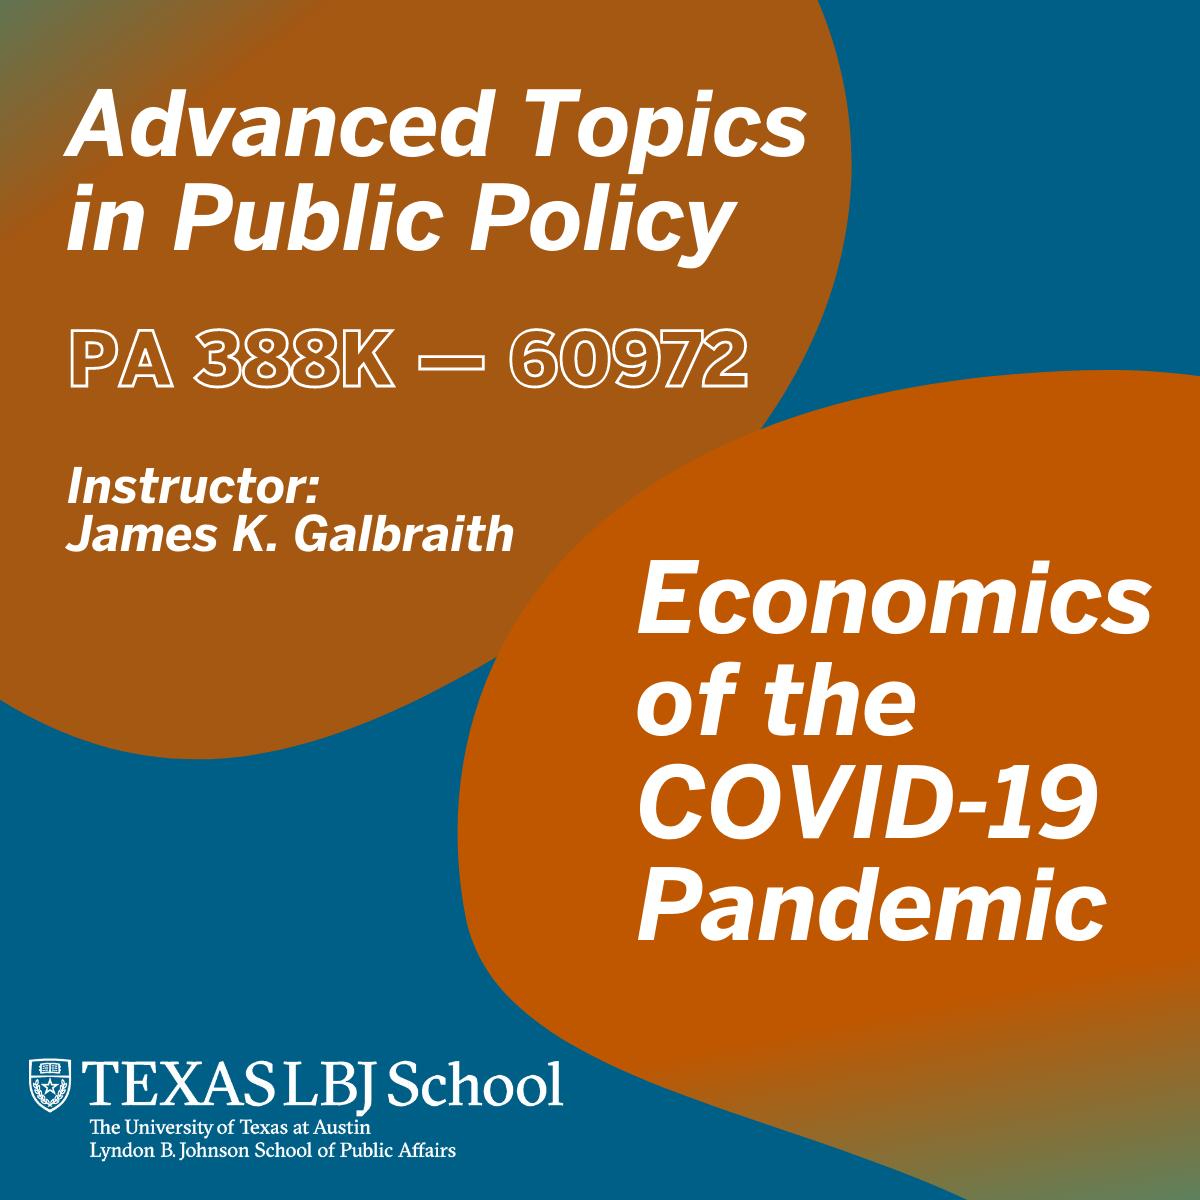 Fall 2021 class: Advanced Topics in Public Policy: Economics of the COVID-19 Pandemic